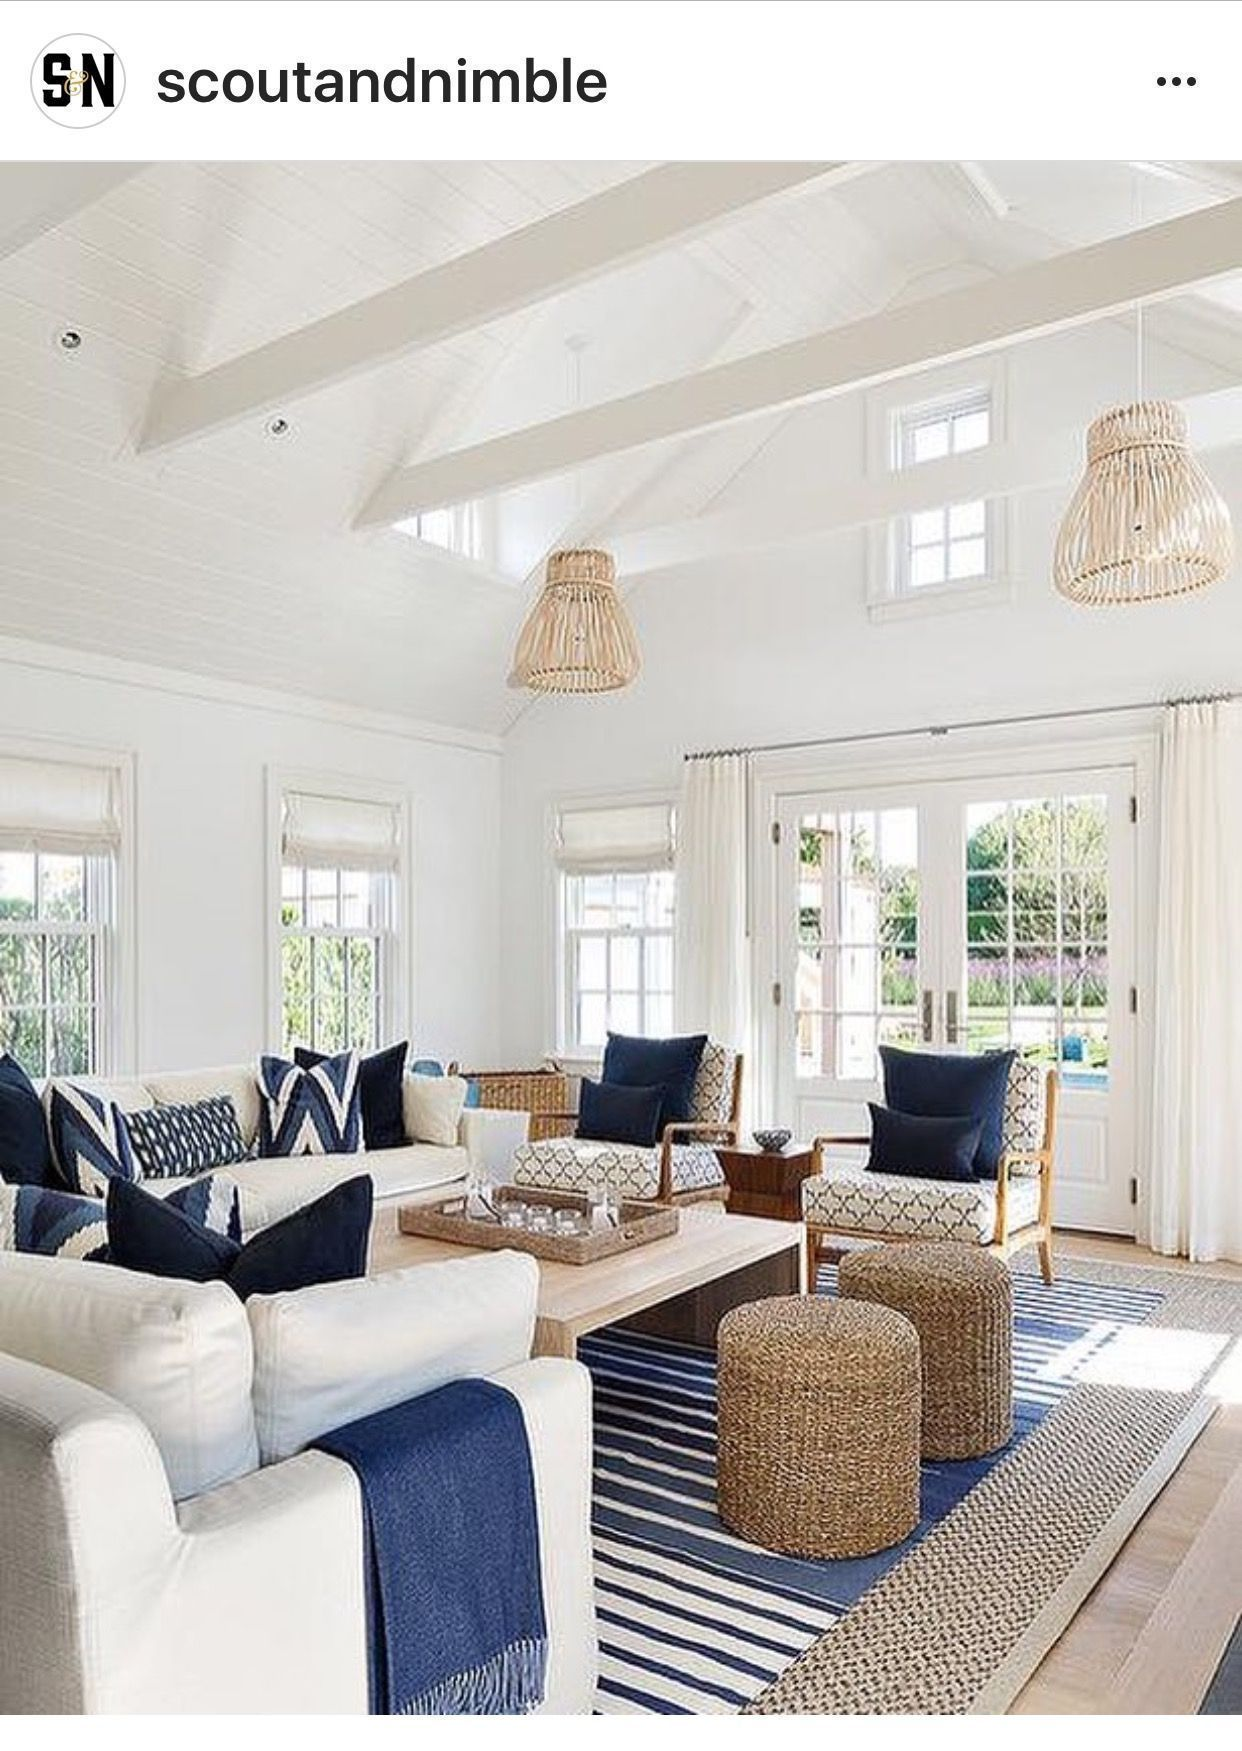 Light and bright coastal interior with a